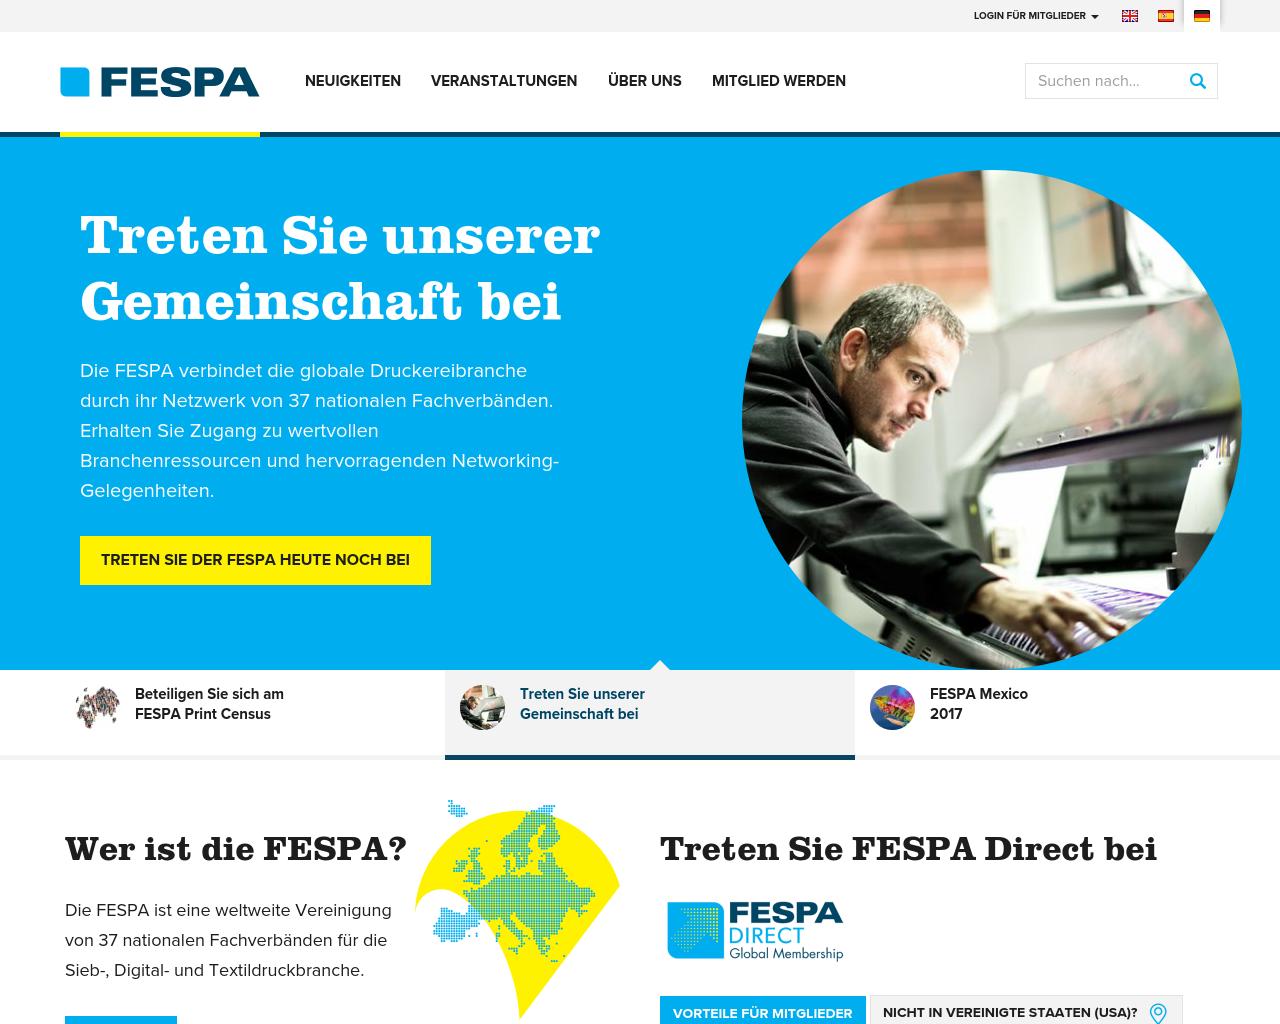 FESPA-Advertising-Reviews-Pricing